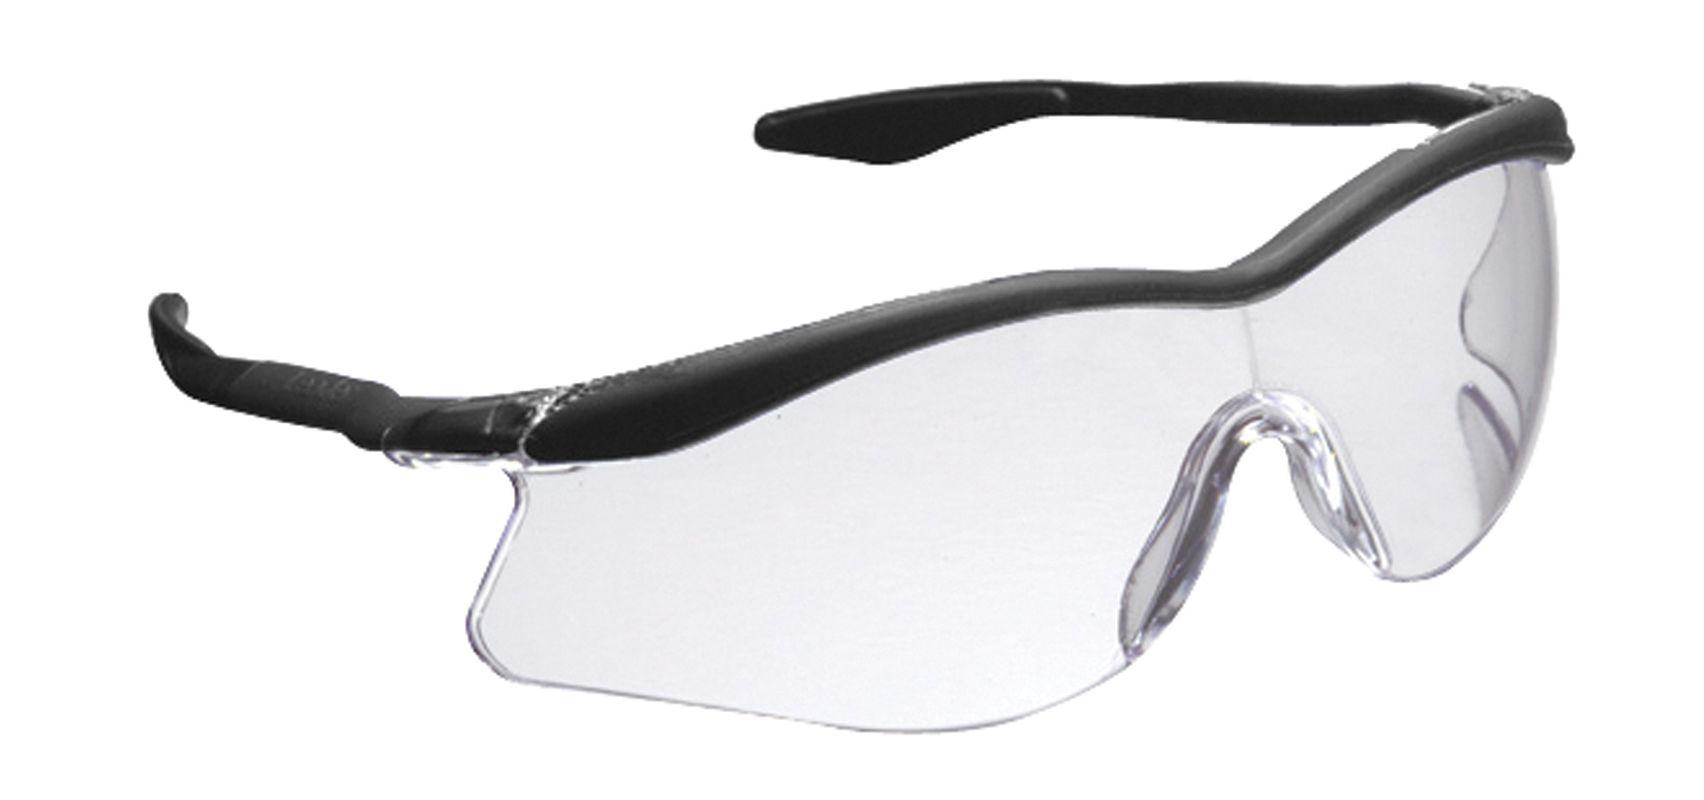 3M 90897 ForceFlex Safety Glasses